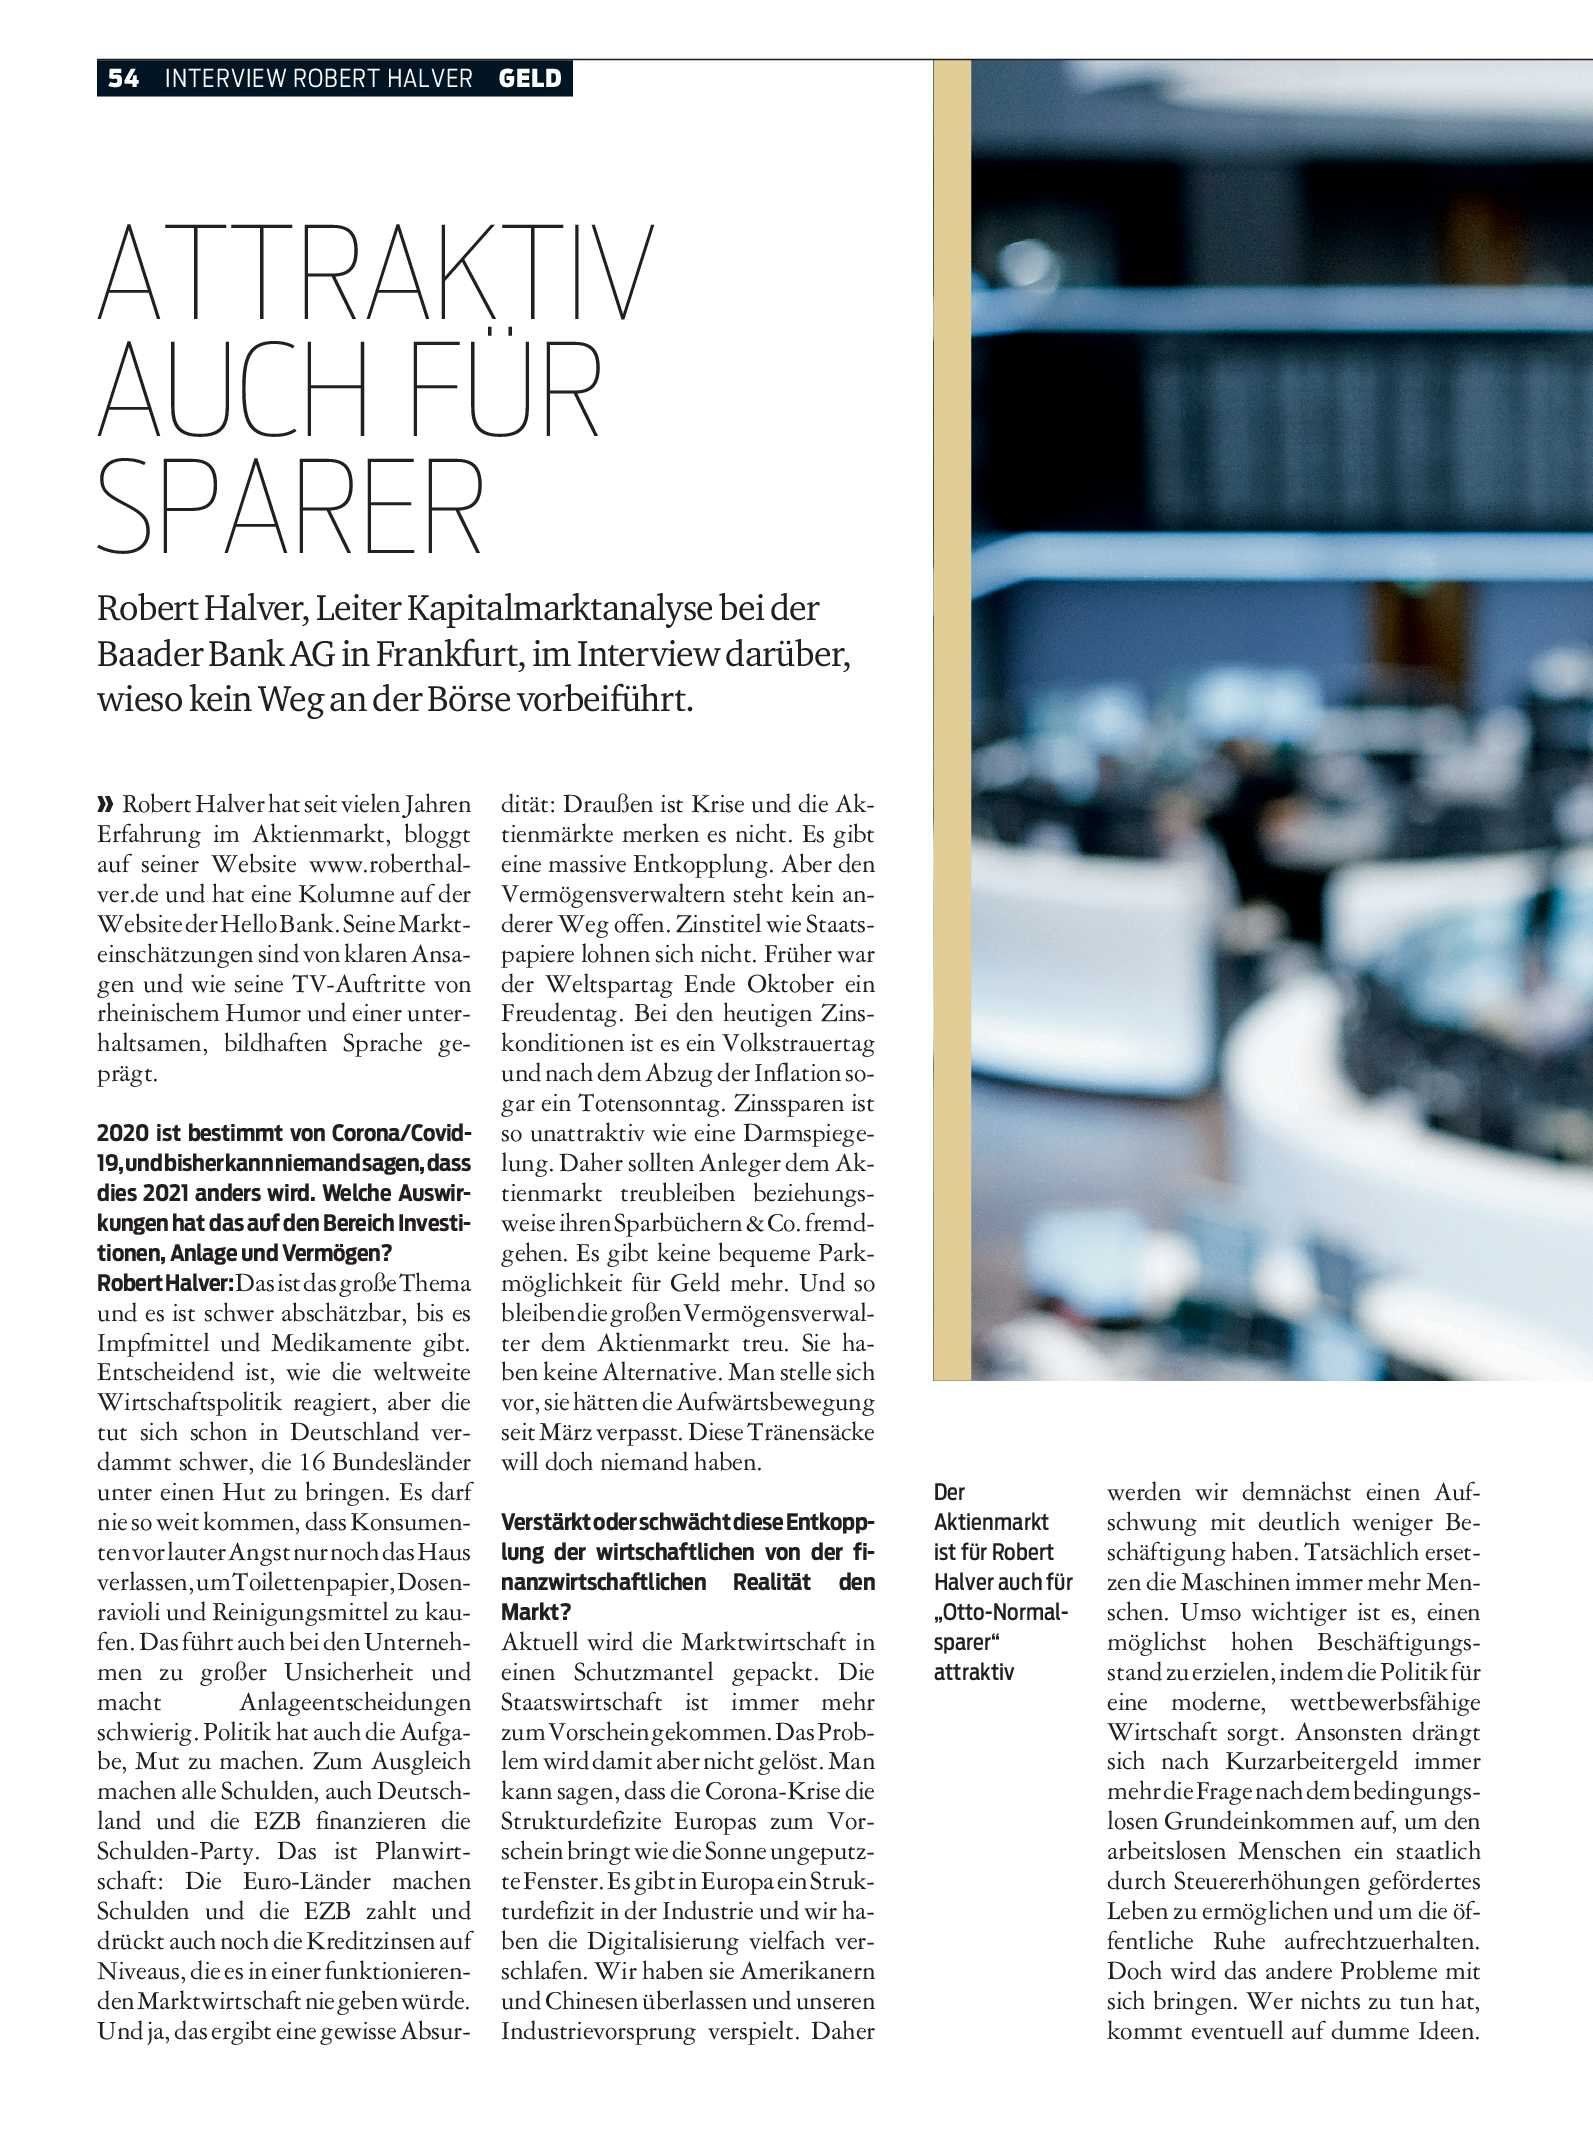 public/epaper/imported/20201118/kurier/magazin/magazin_20201118_054.jpg